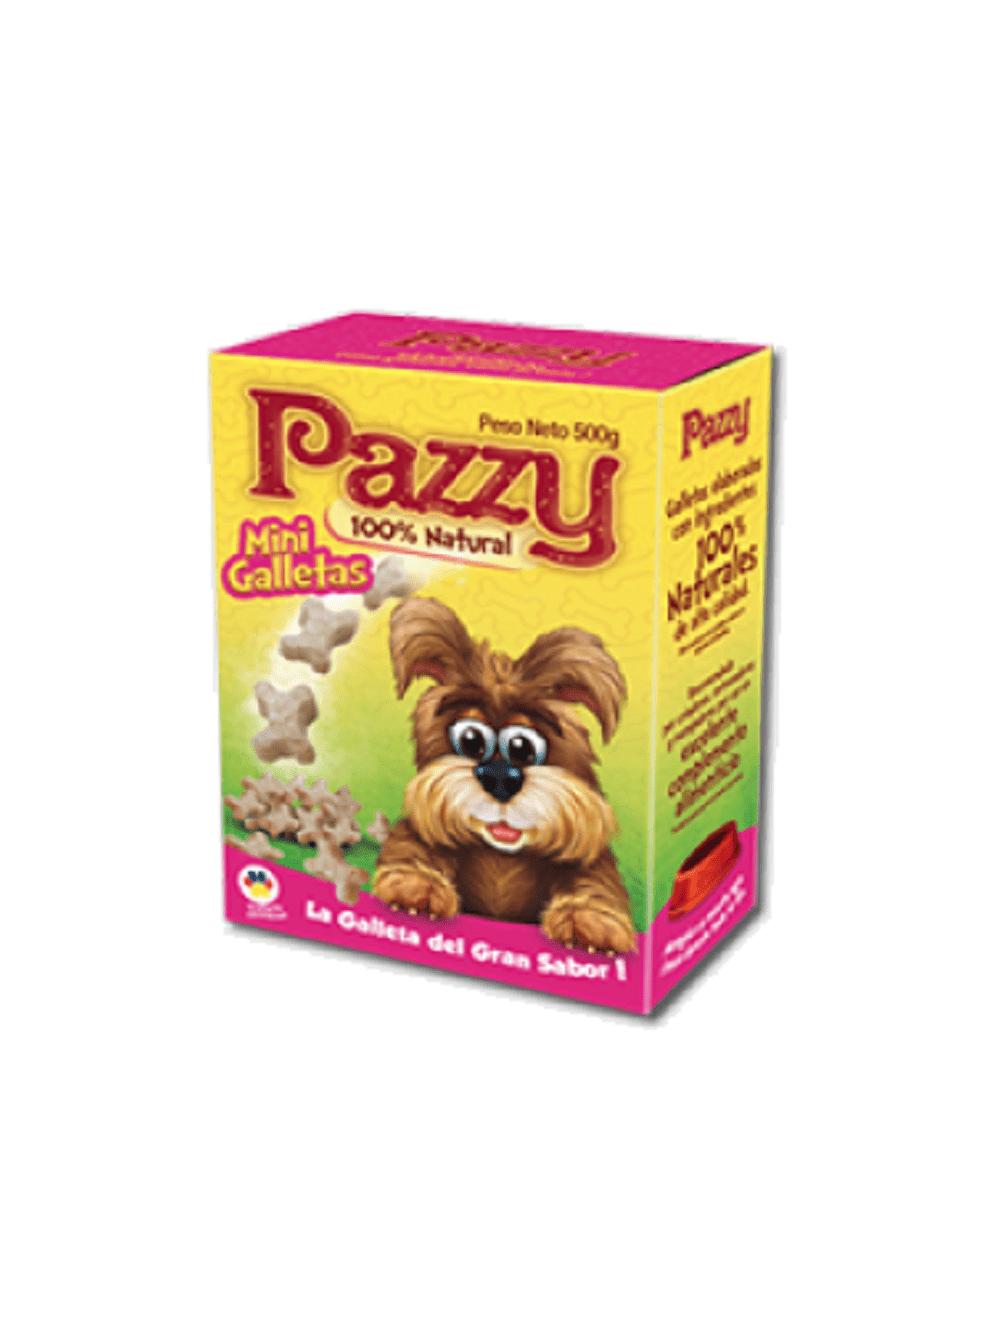 Galletas Pazzy Mini para Perro Caja